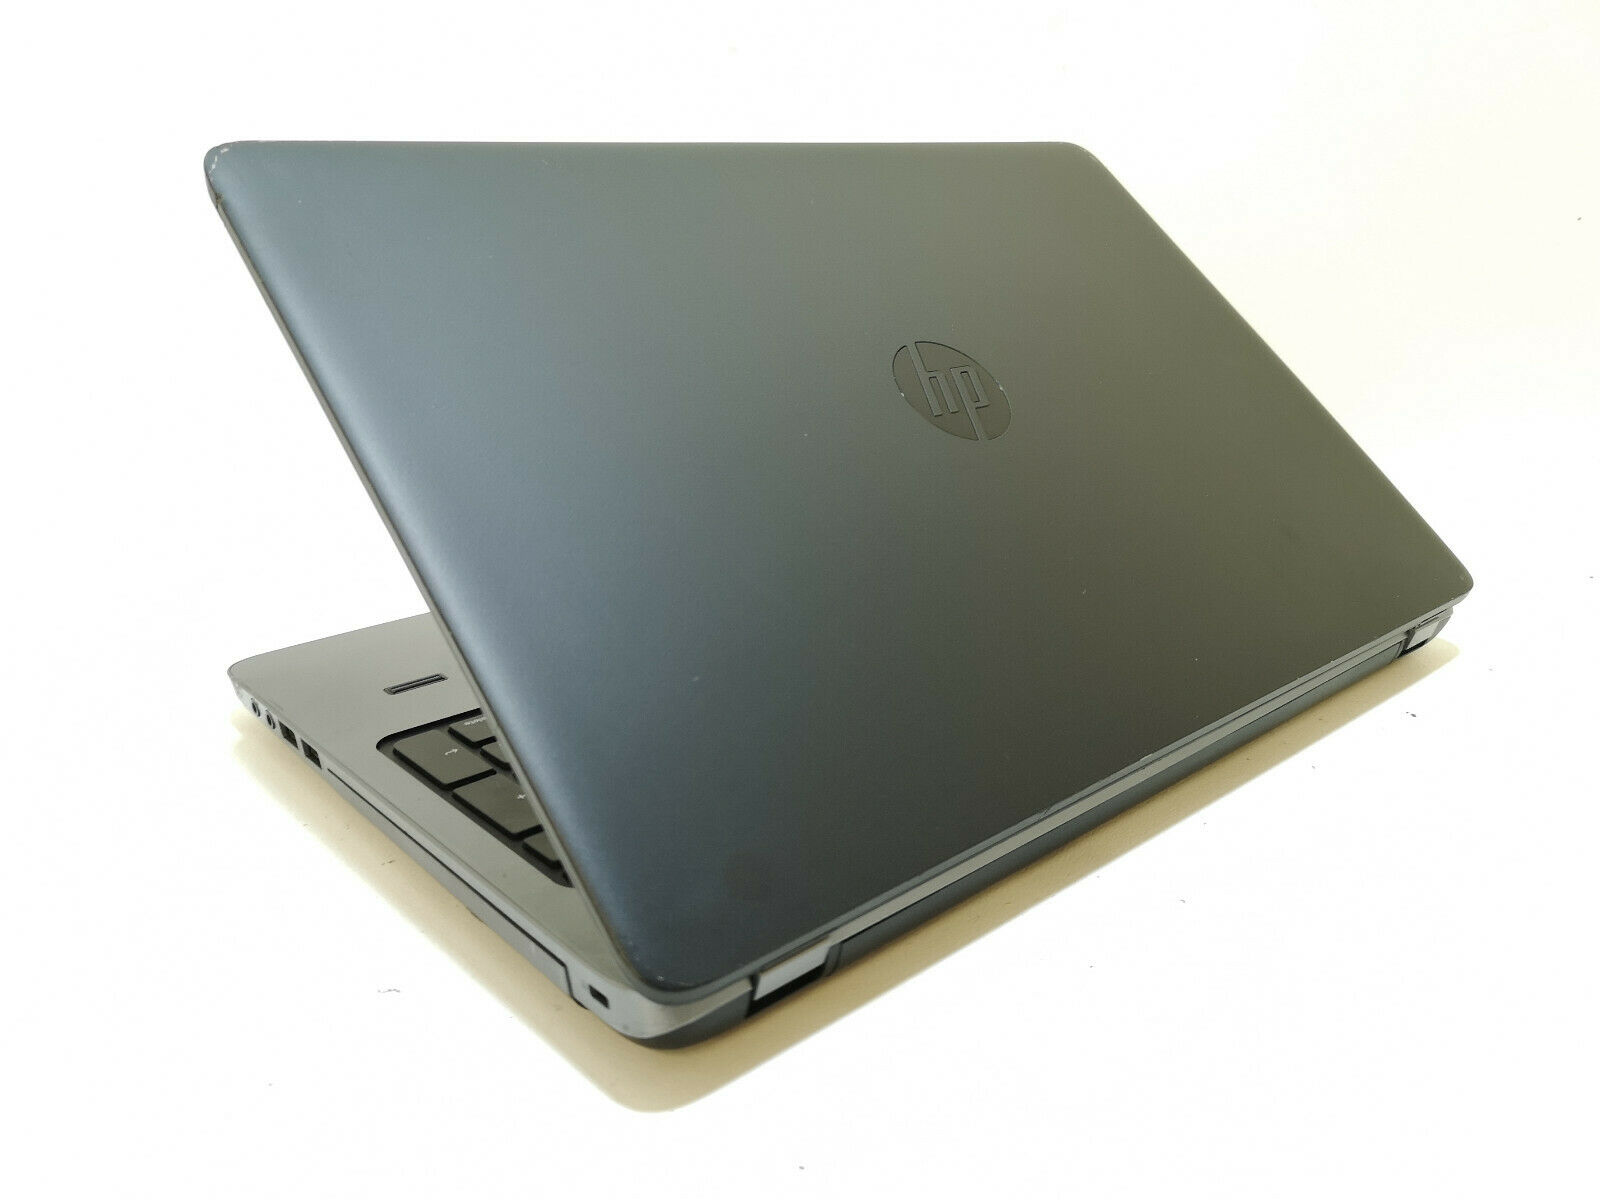 HP Probook 455 G1 No 6